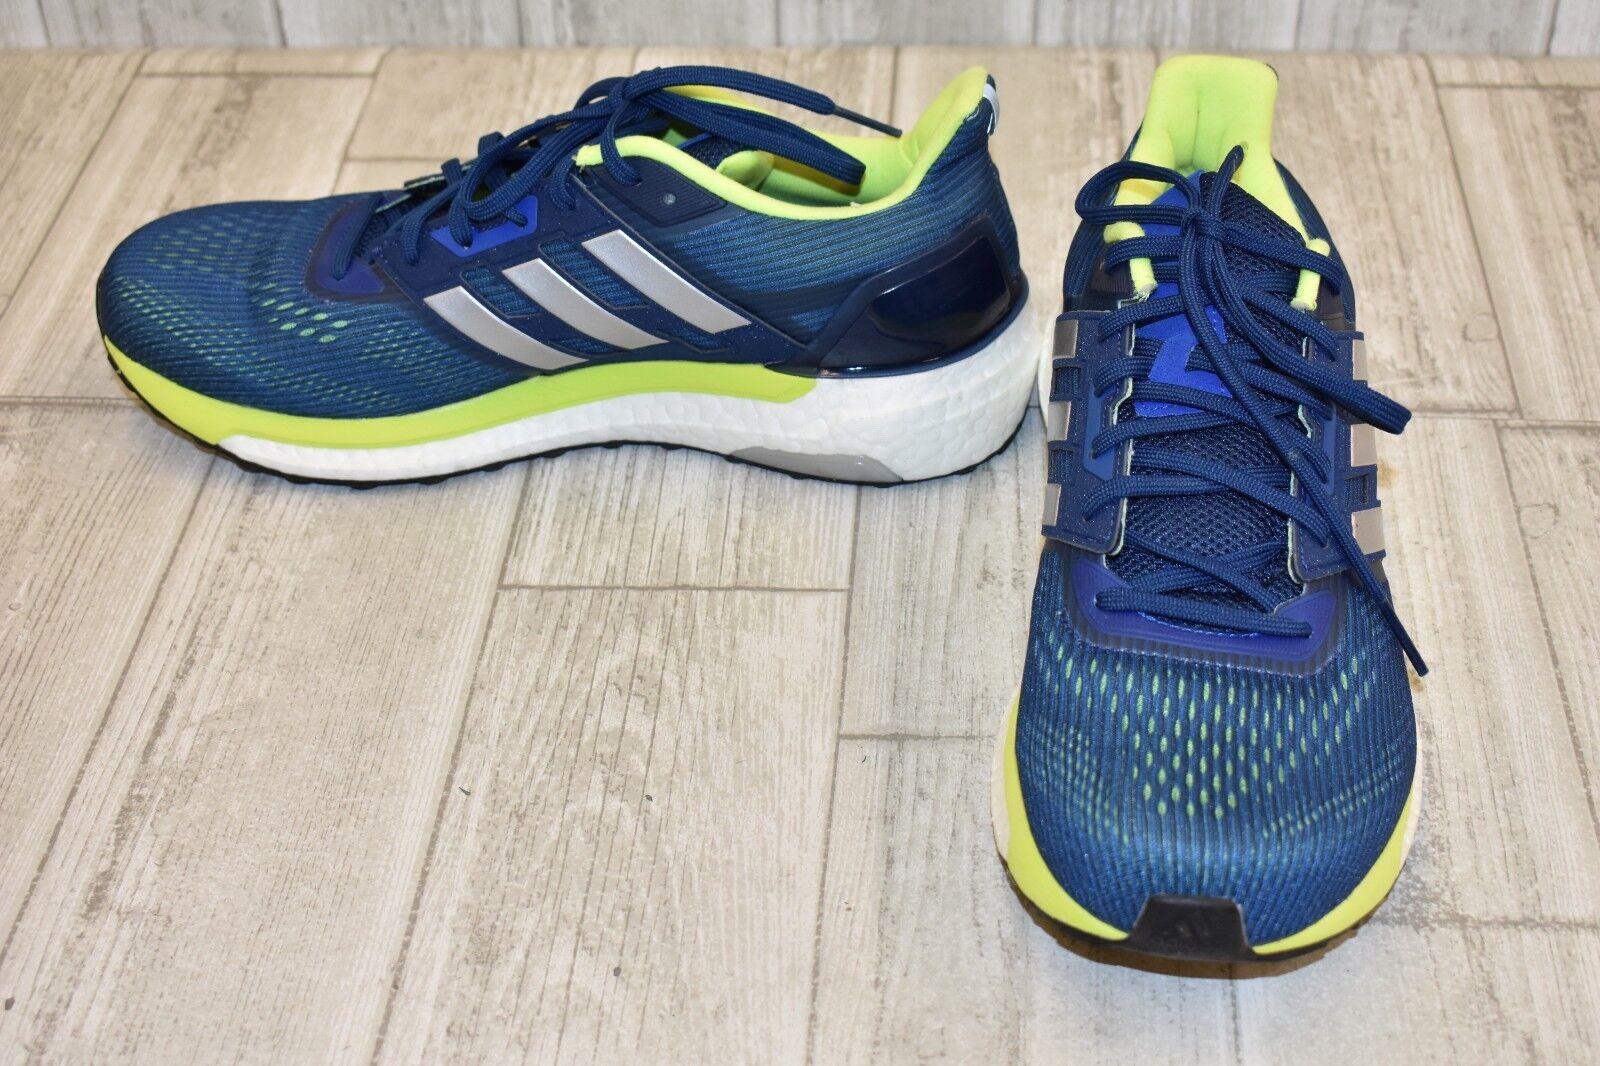 Adidas Supernova Athletic shoes - Men's Size 10.5 - Multicolor